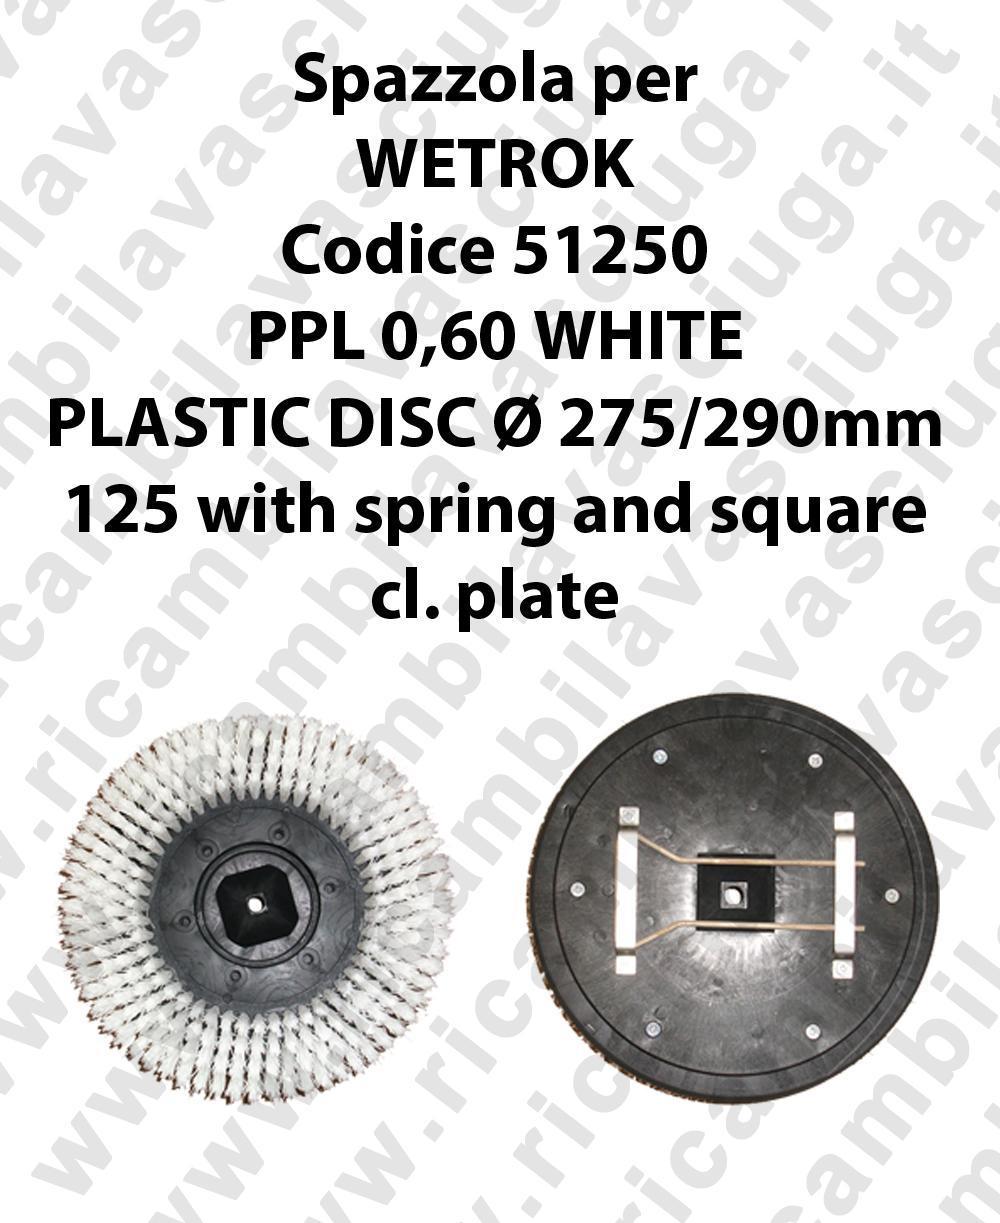 Cleaning Brush PPL 0,60 WHITE for scrubber dryer WETROK Code 51250